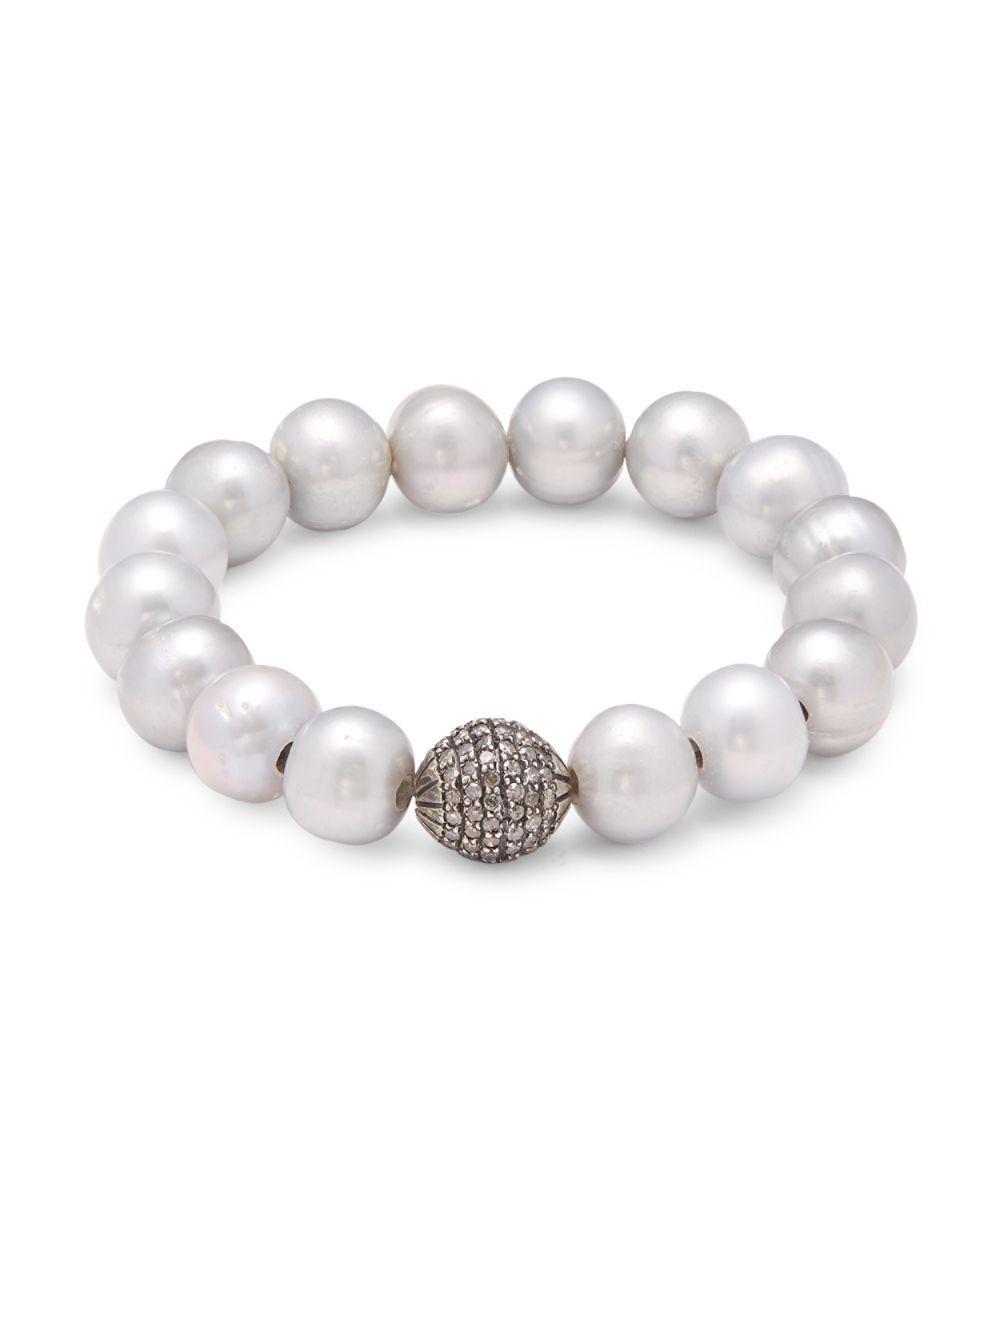 Bavna Pearl & Diamond Pavé Bracelet lKzZe6